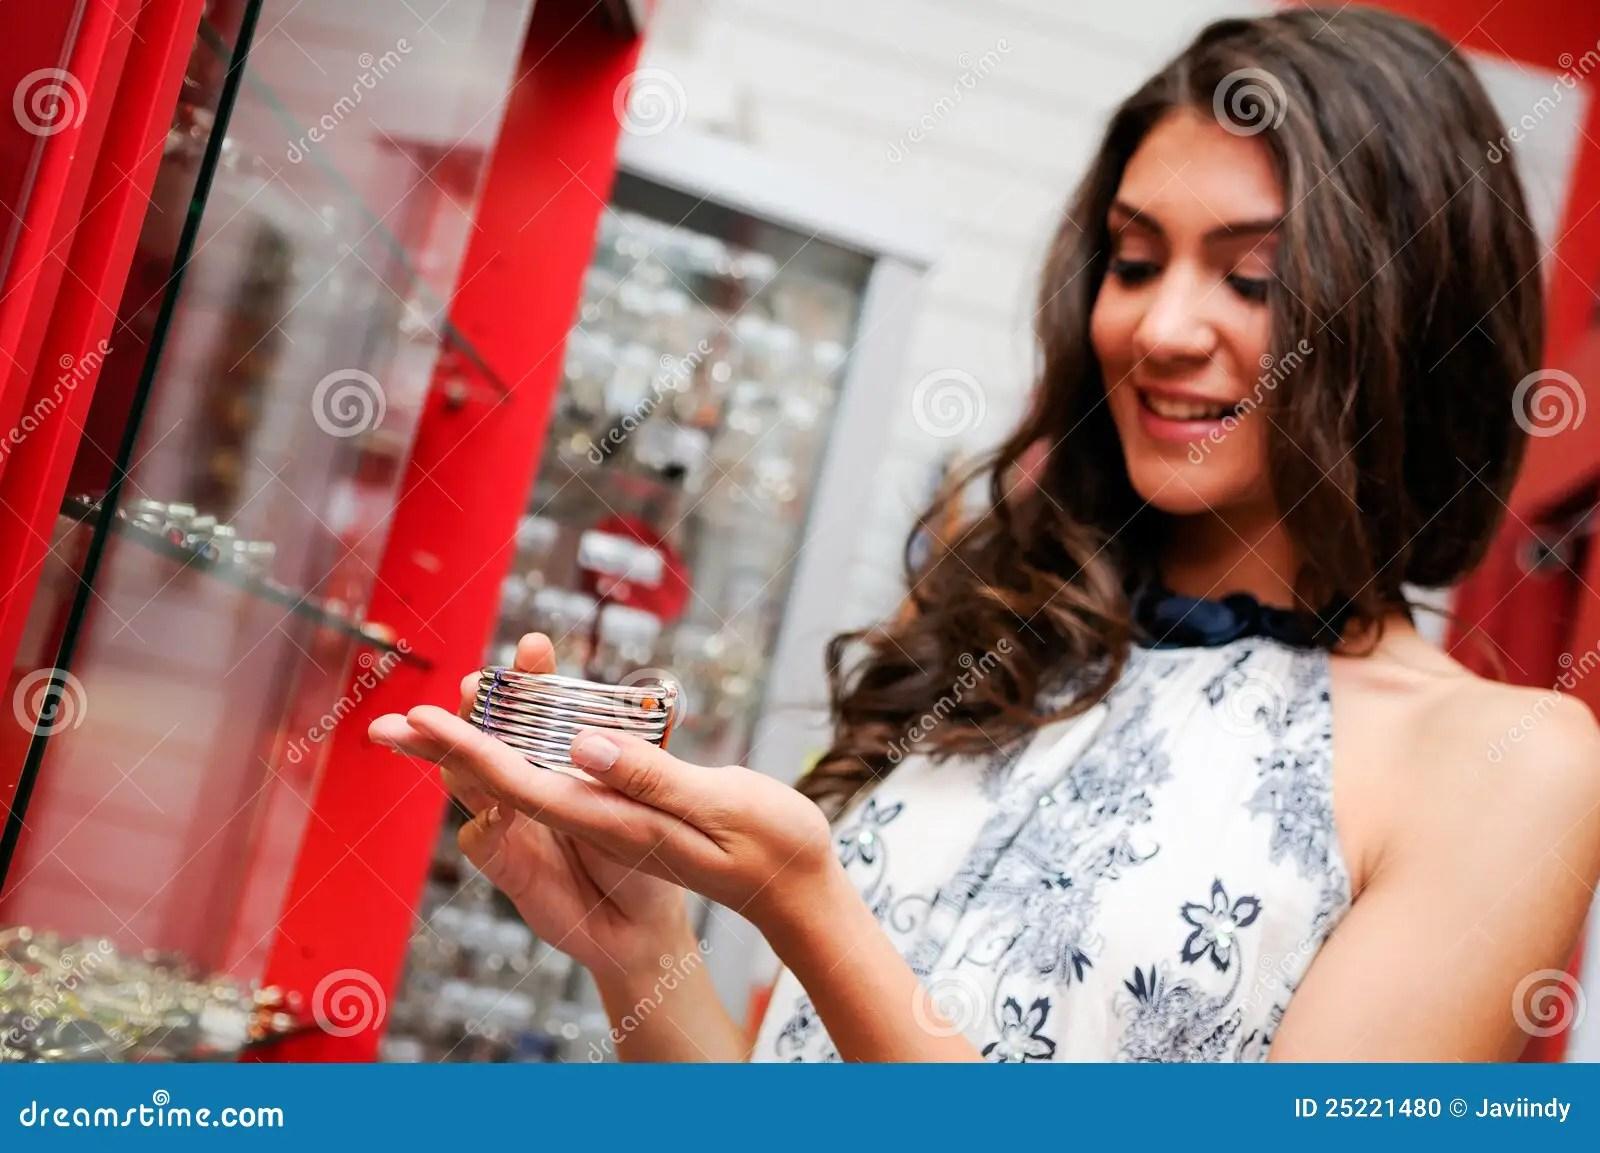 Where Buy Fresh Makeup